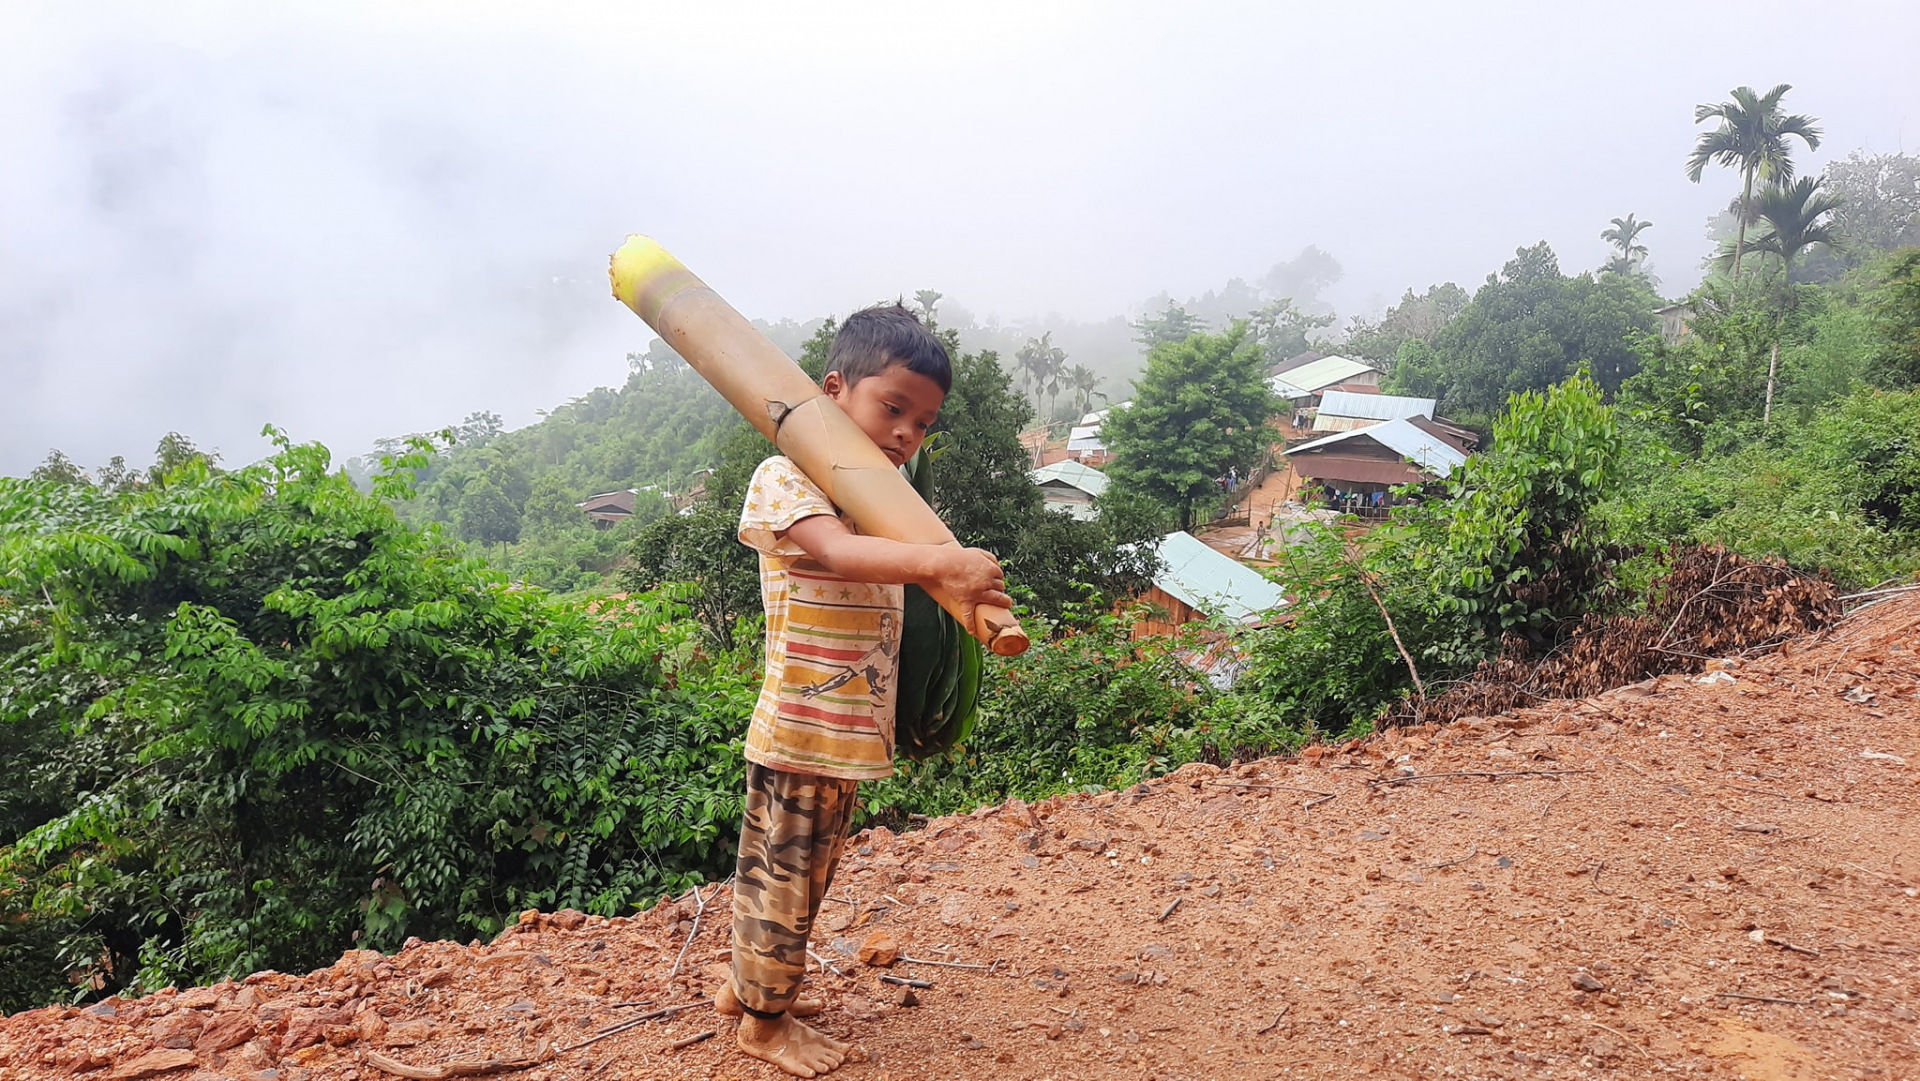 vietnamese boy carrying forest bamboo shoot to support da nang covid 19 hotspot